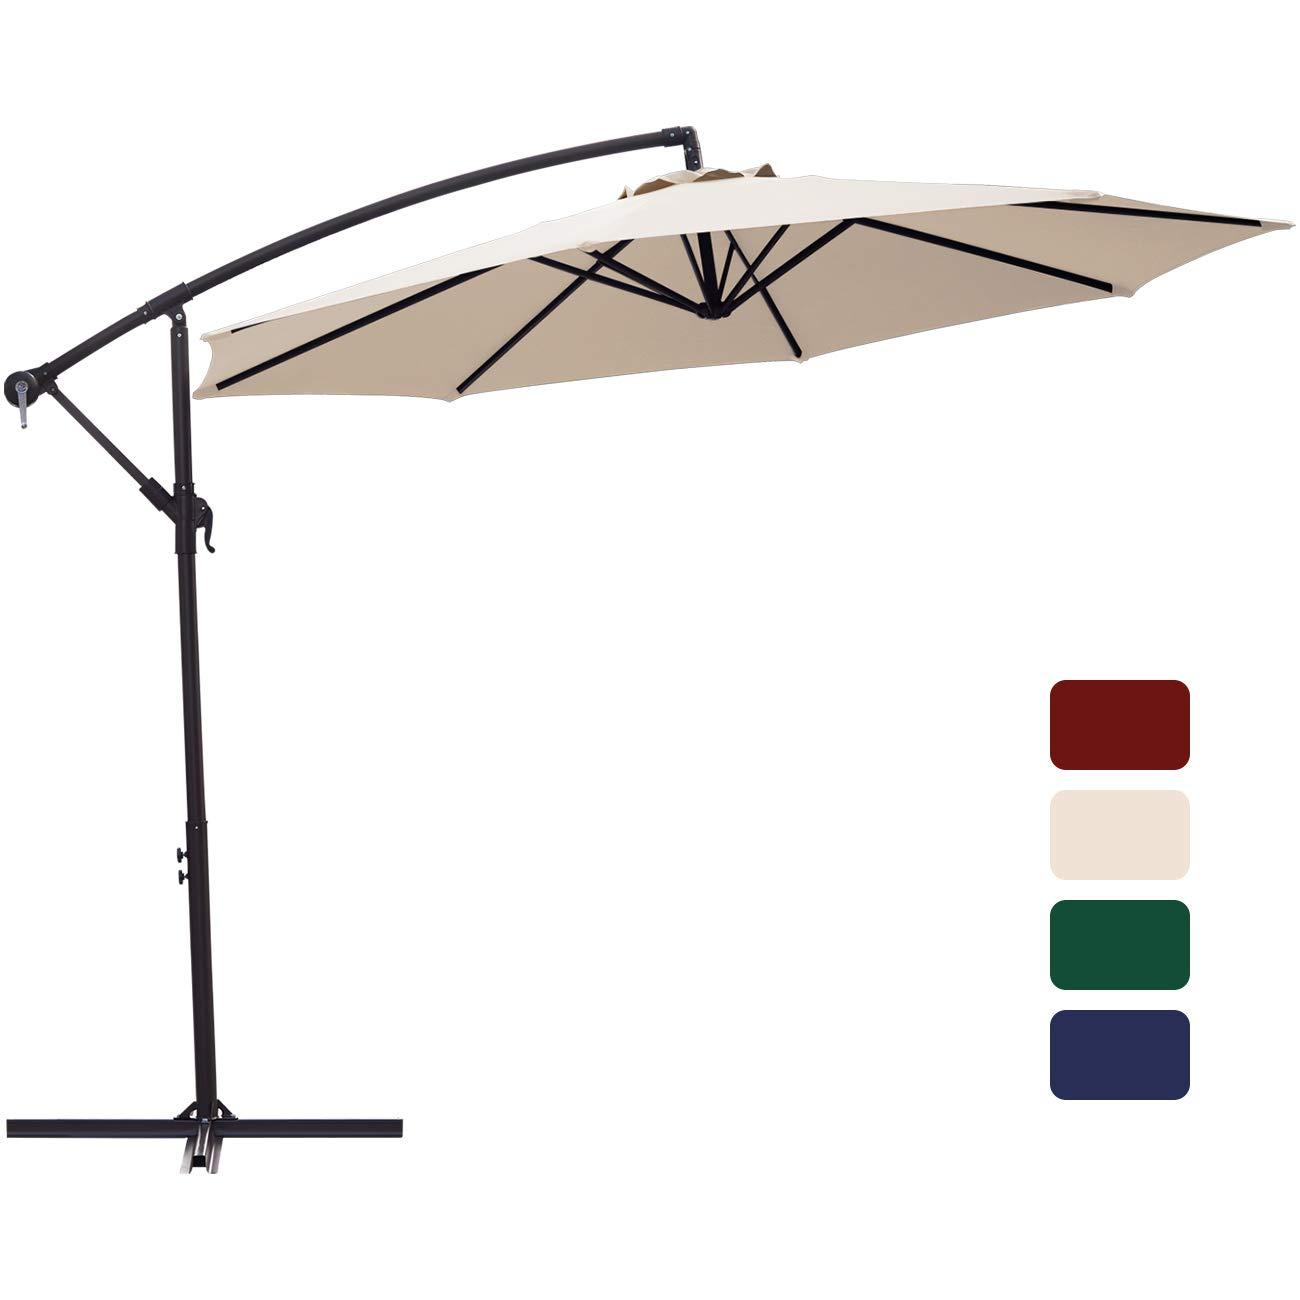 Patio Umbrella 10 ft Cantilever Offset Umbrella Outdoor Market Hanging Umbrellas Garden Umbrella & Crank with Cross Base, 8 Ribs (Beige)